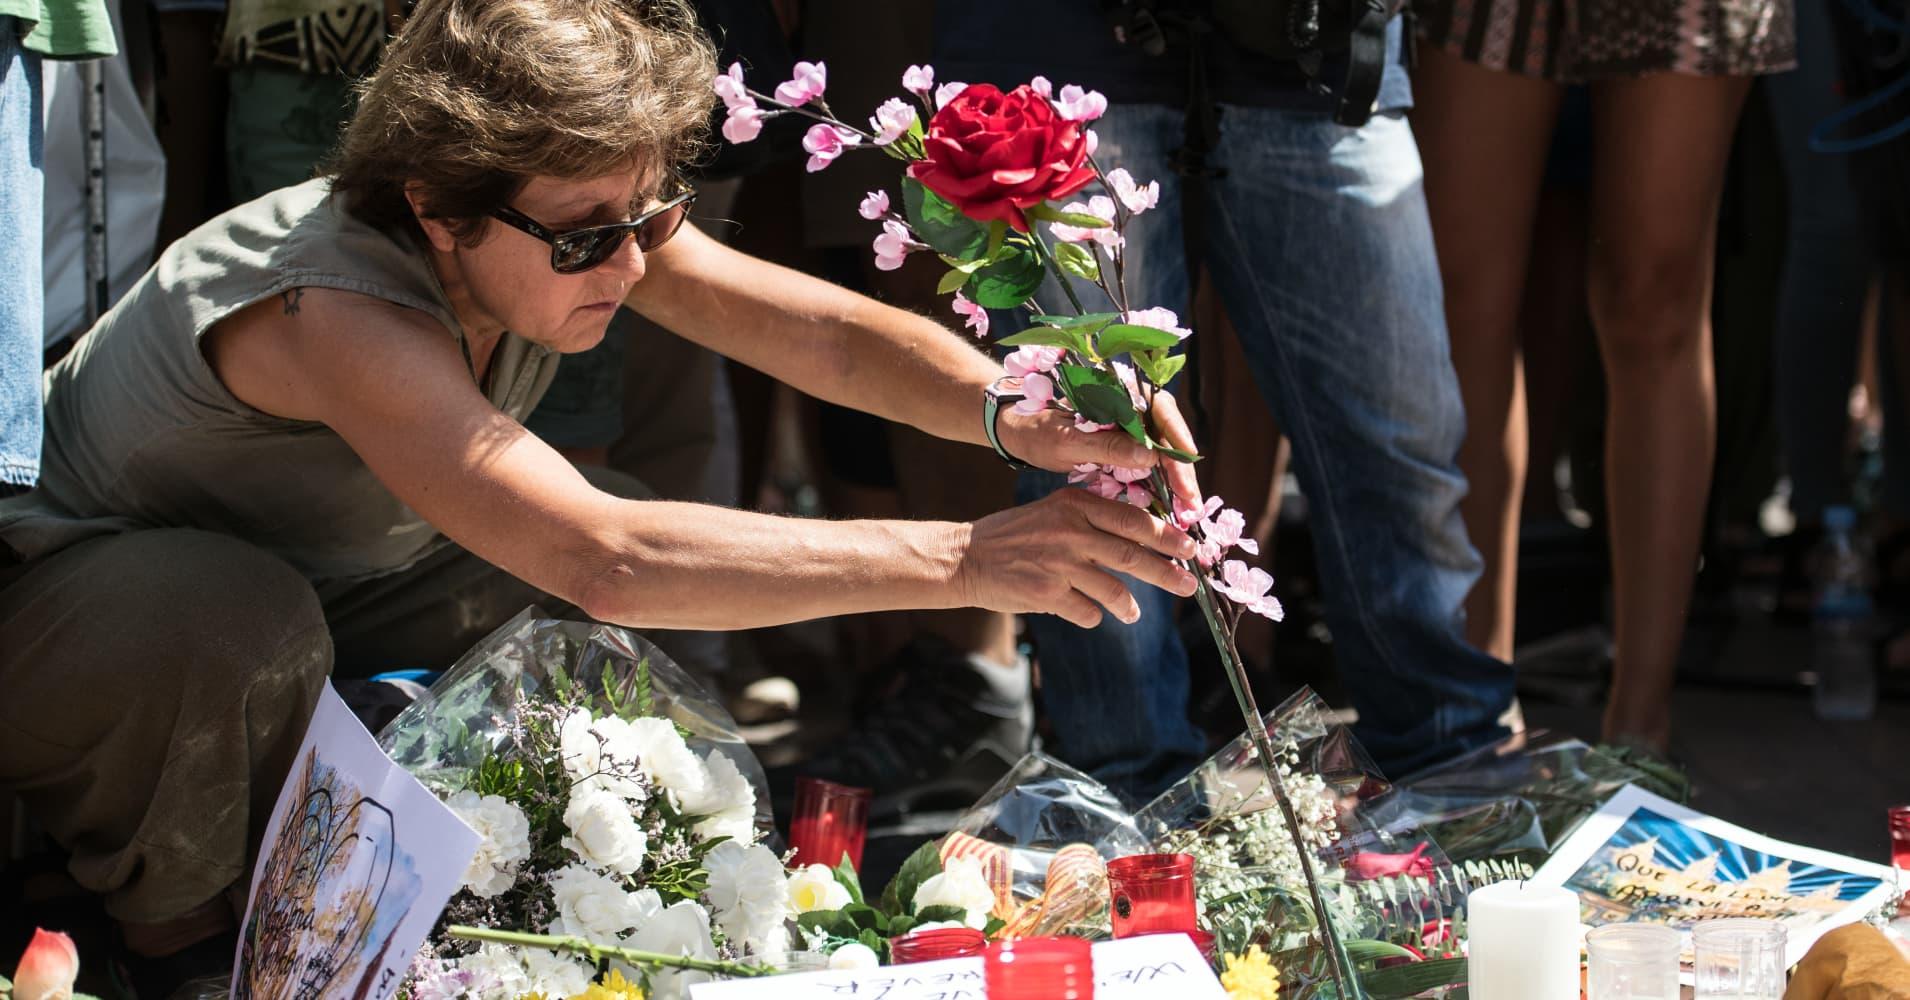 A woman lays a flower on Las Ramblas near the scene yesterday's terrorist attack, on August 18, 2017 in Barcelona, Spain.